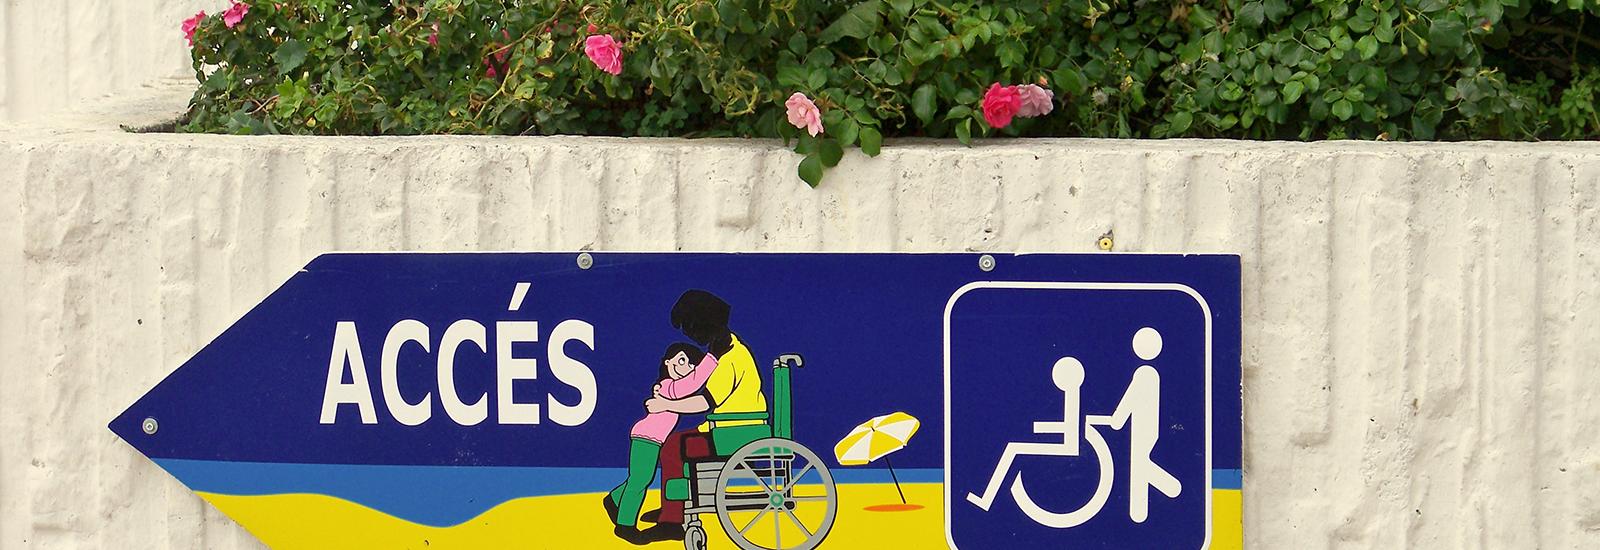 enquete satisfaction sig audit diagnostic handicap accessibilite geonauvh